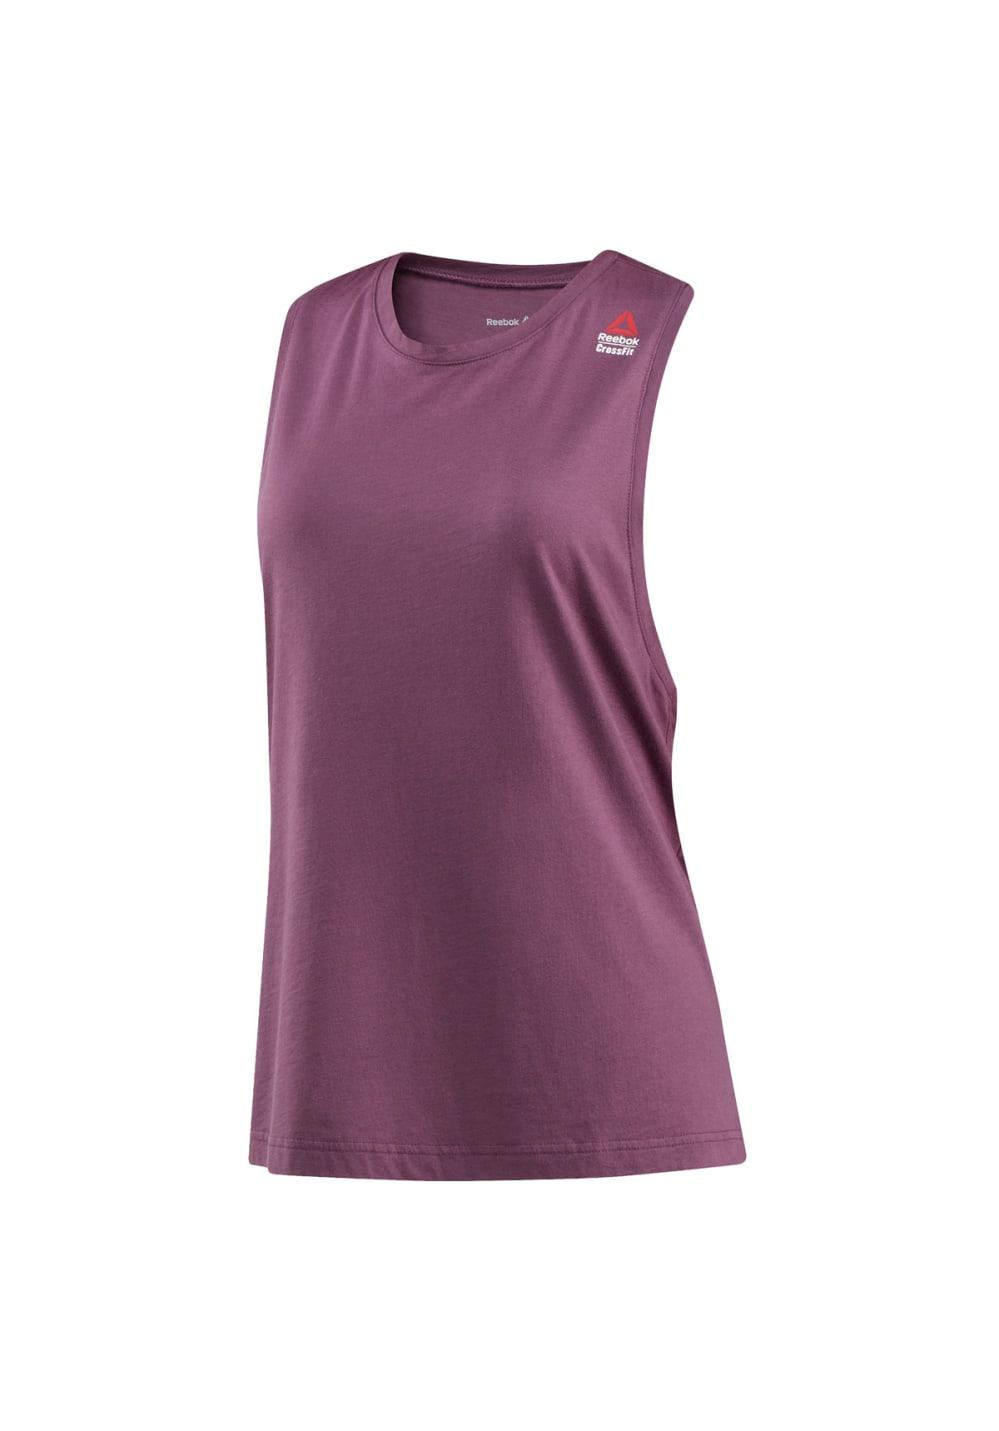 Reebok Crossfit Muscle Tank - Sprayed - Fitnessshirts für Damen - Lila, Gr. XS